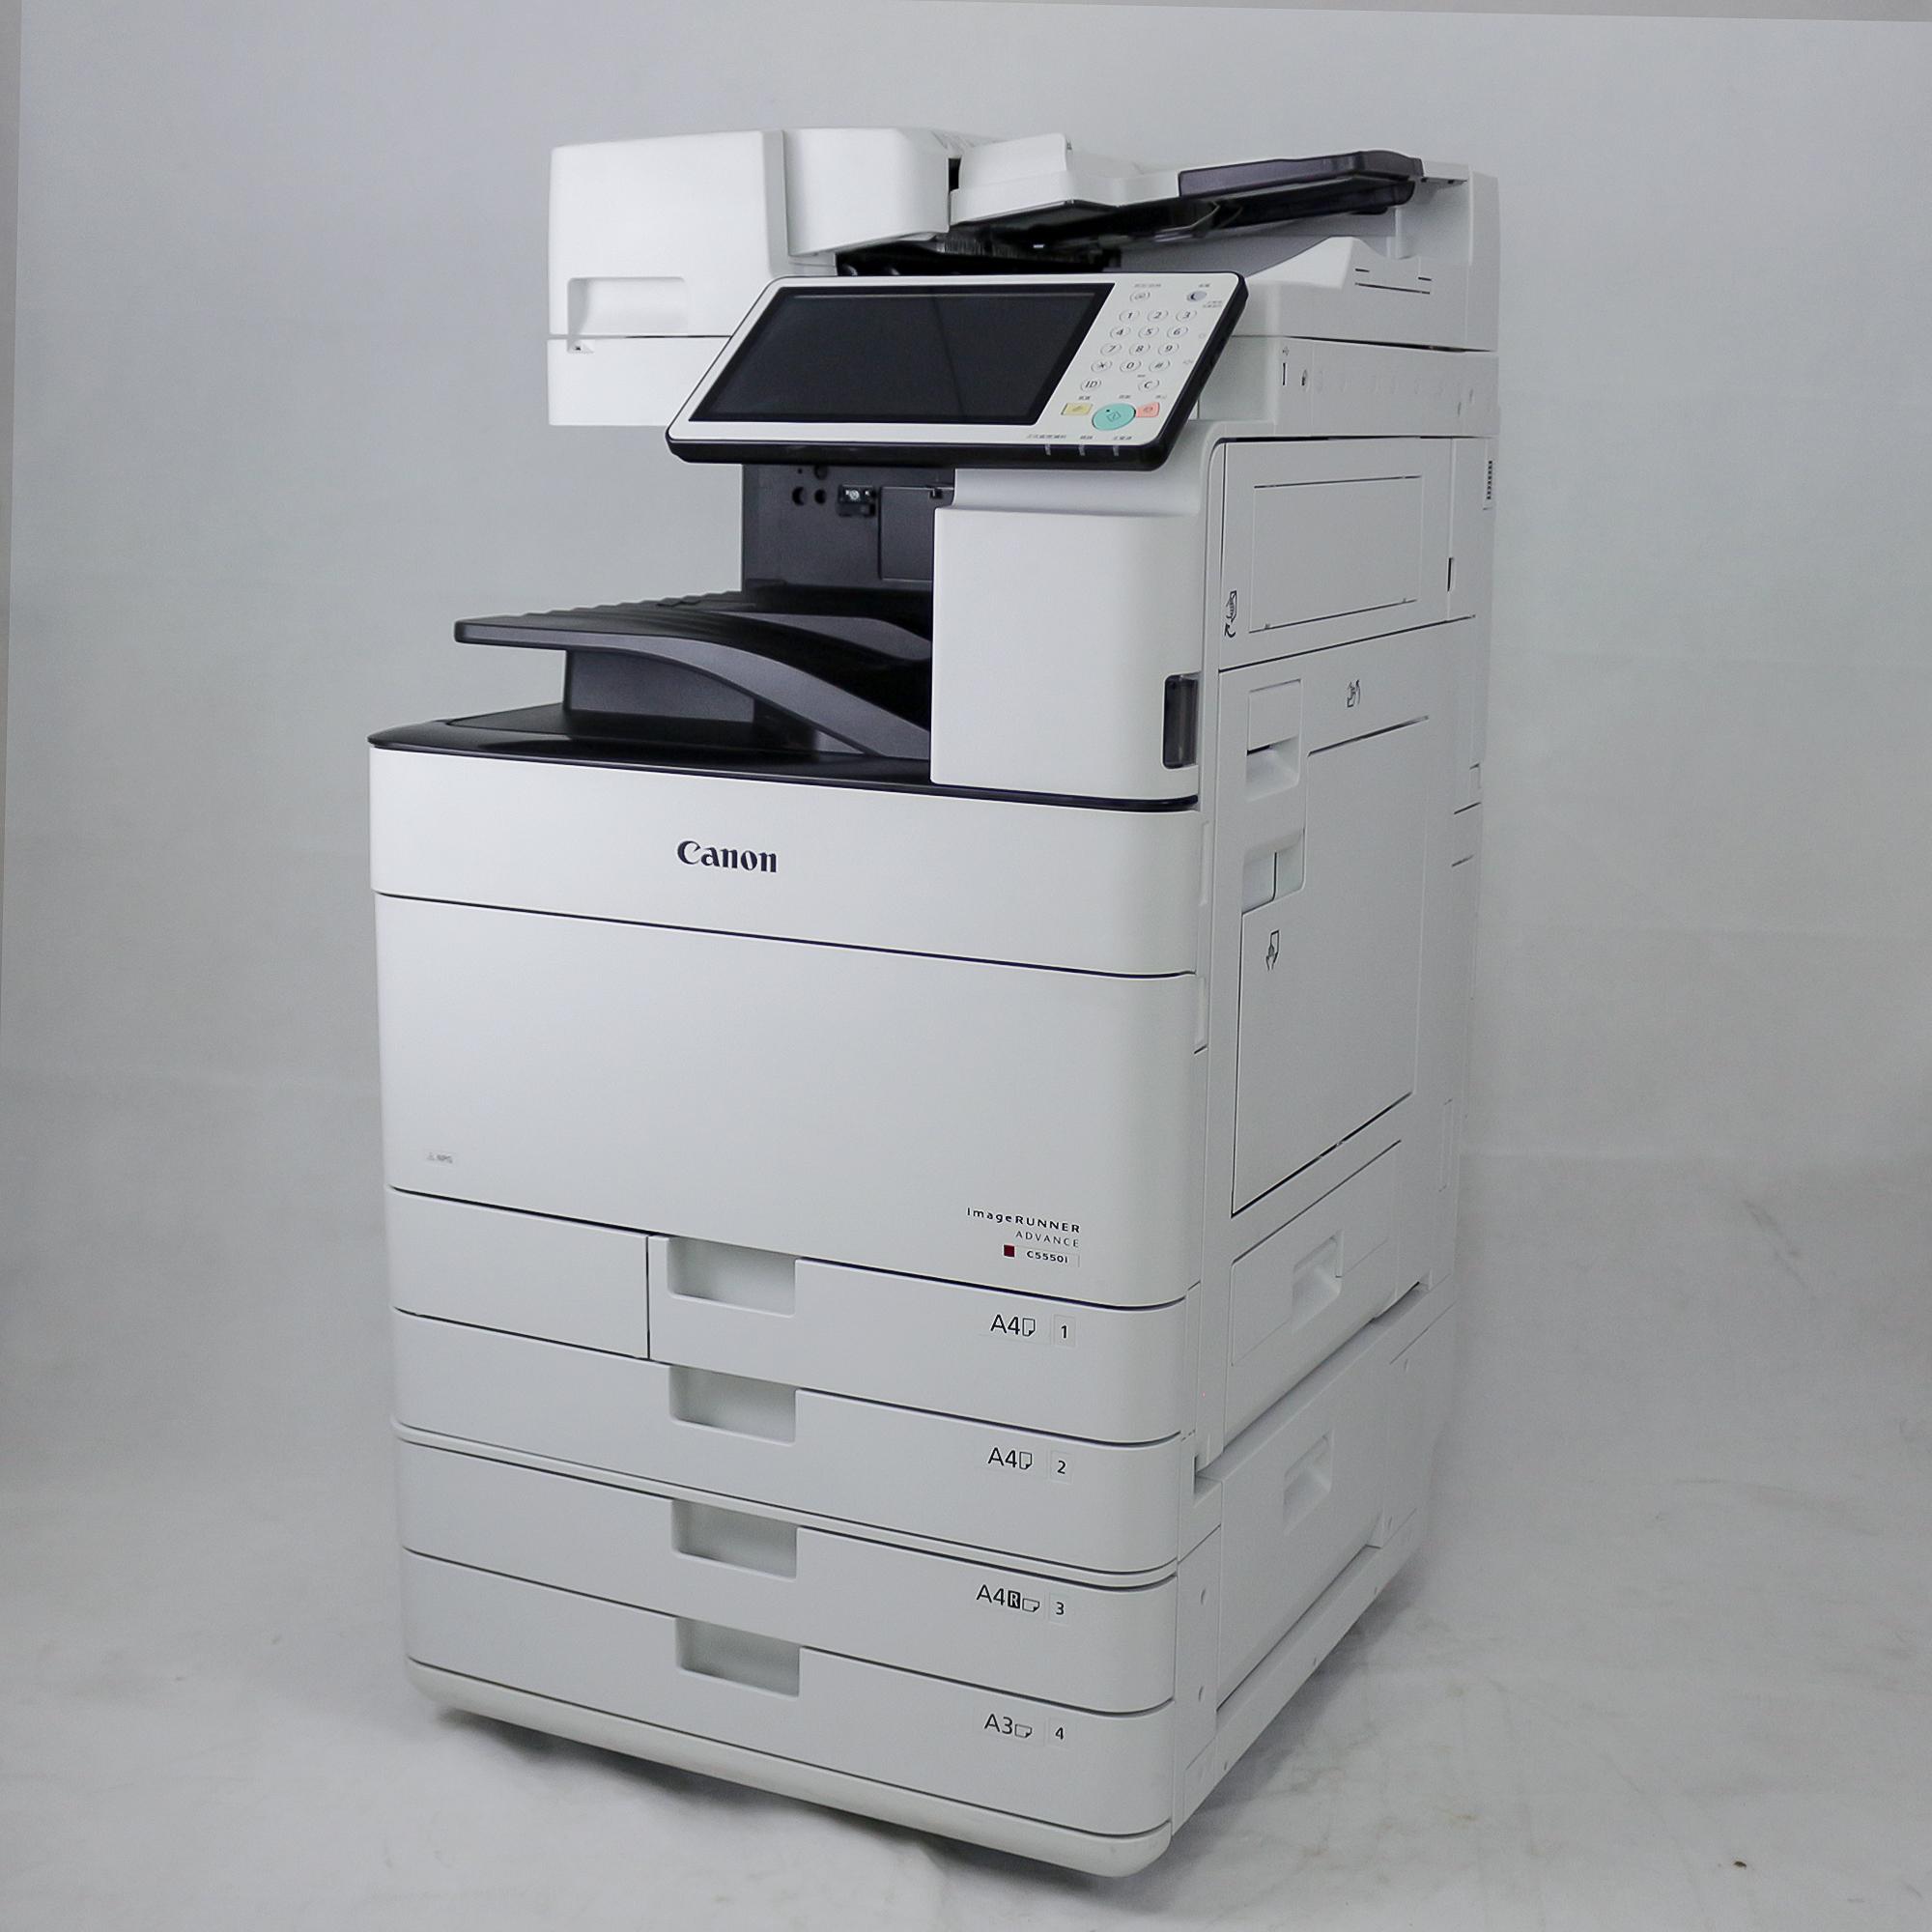 Wholesale fotocopy machines CANON imageRUNNER ADVANCE C5550i  Refurbished Used Copier MFP